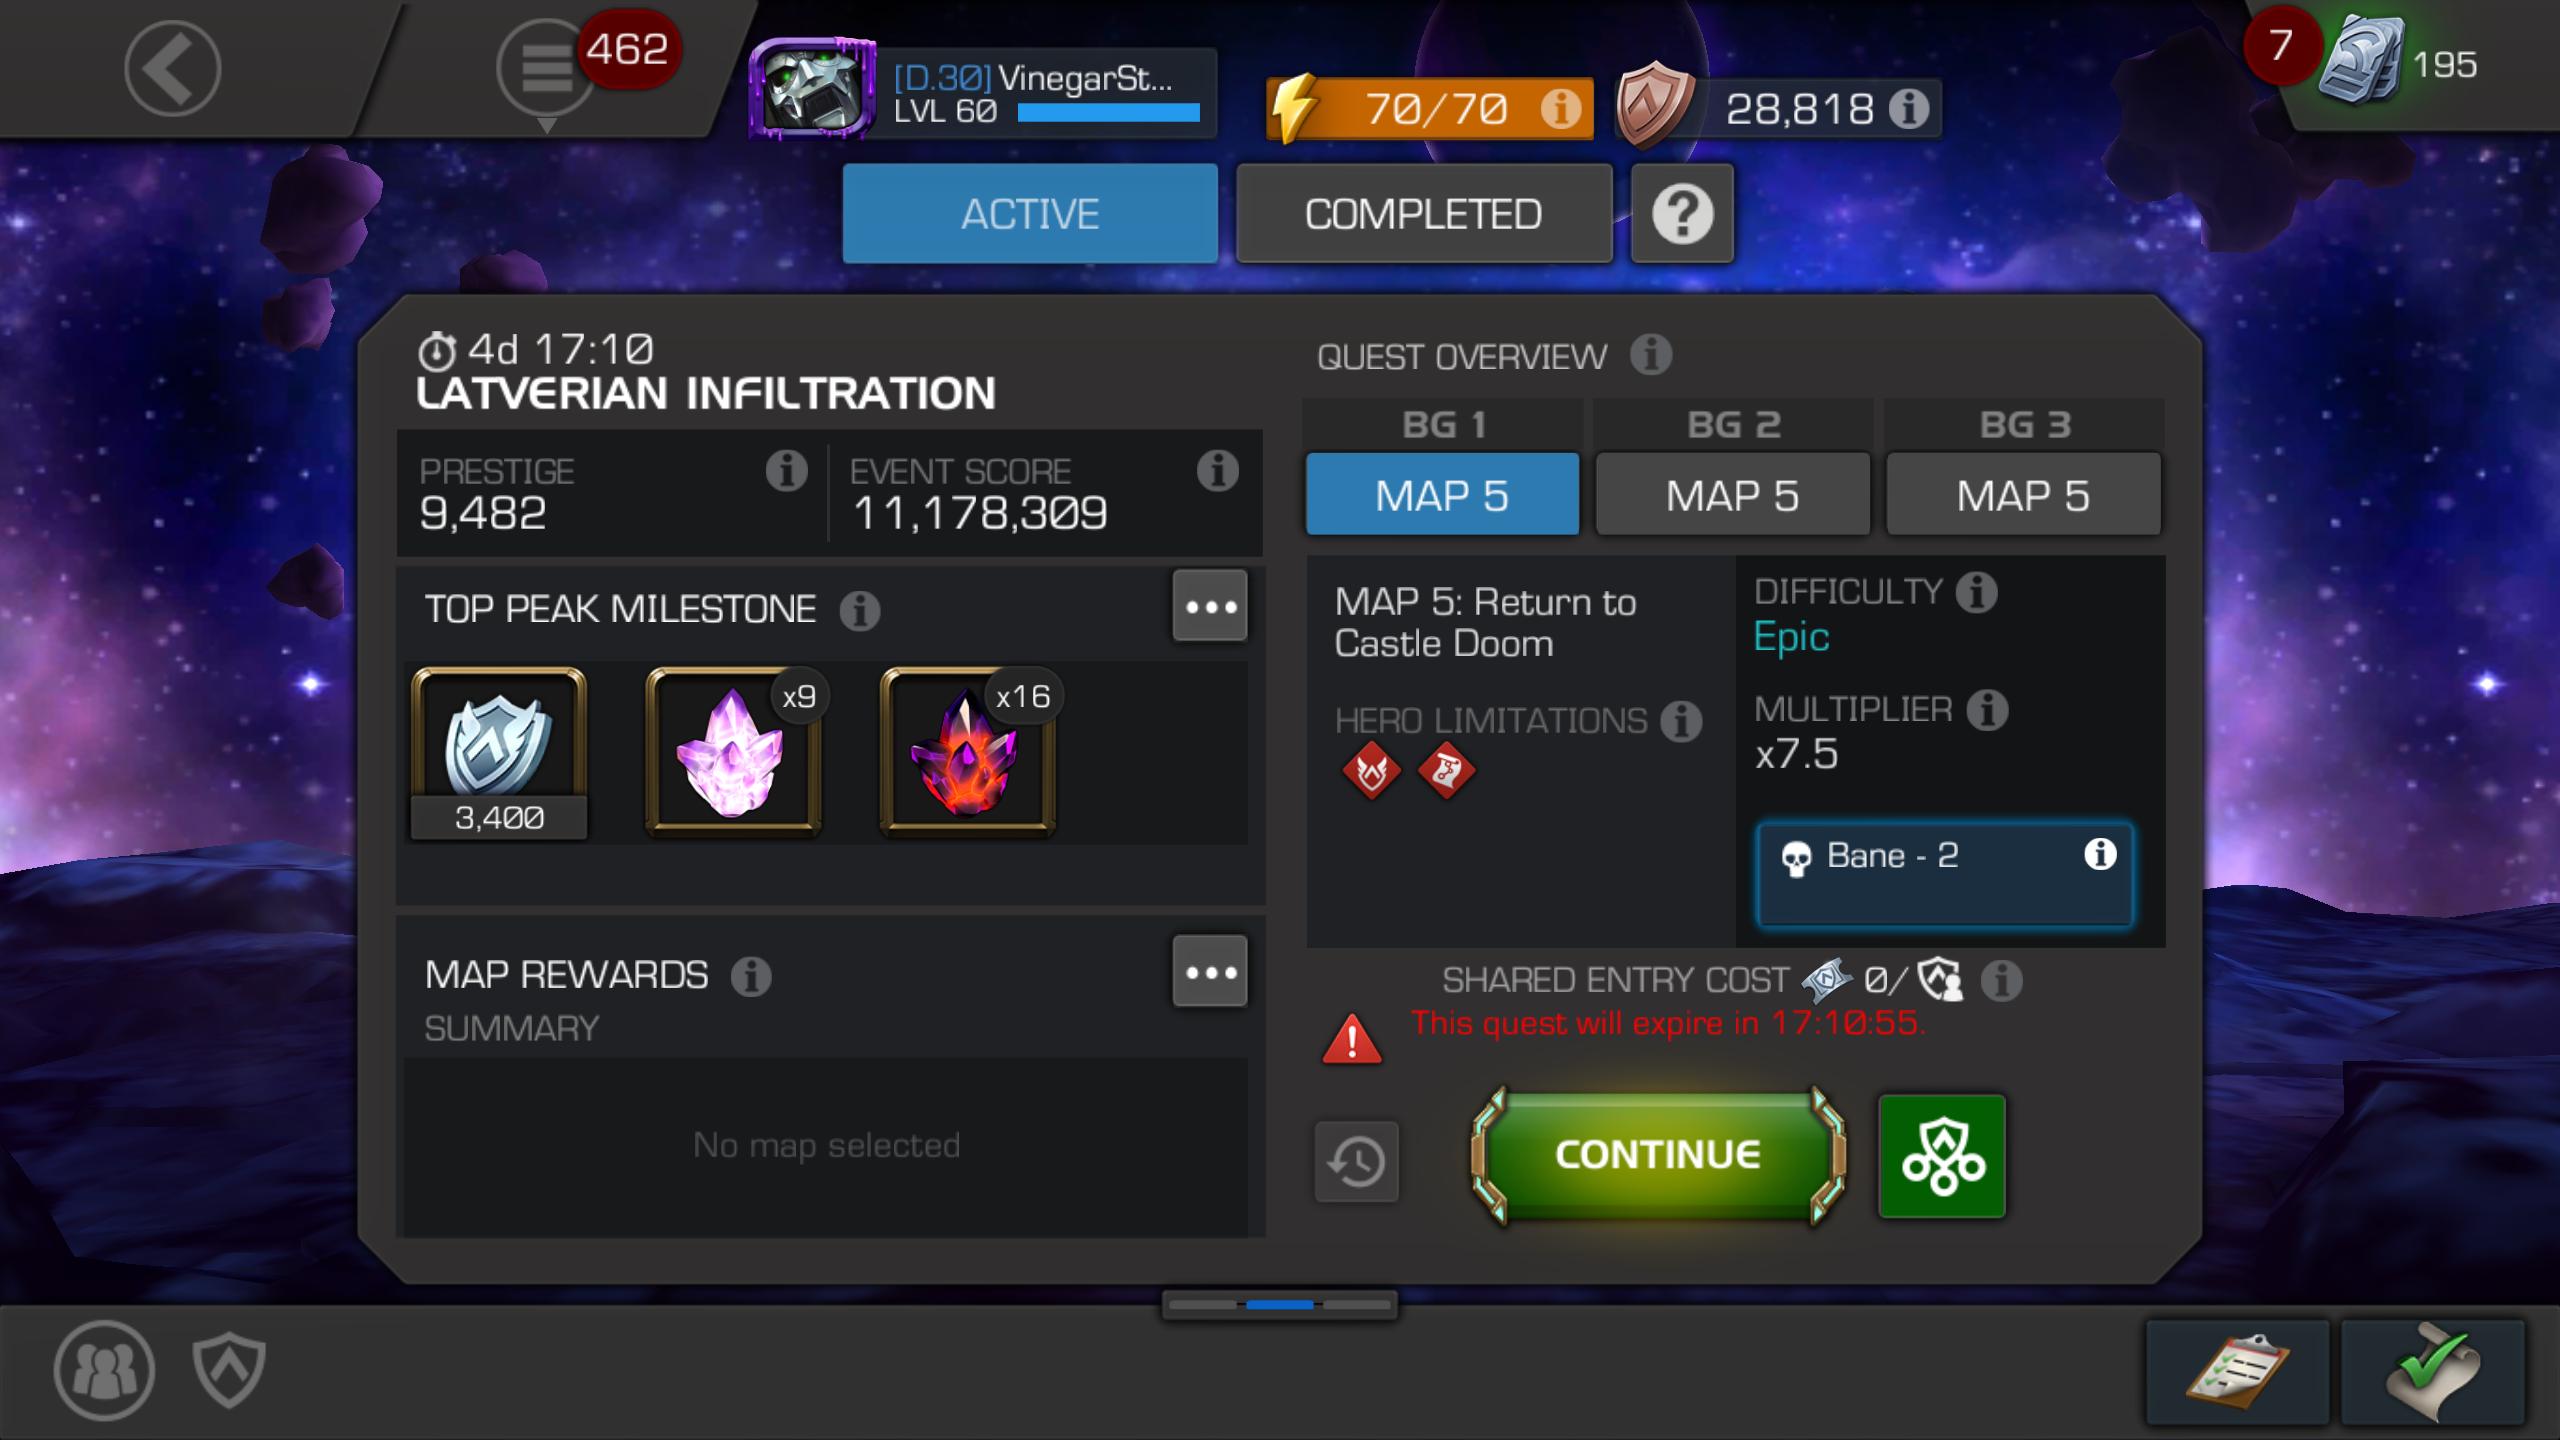 AQ Information